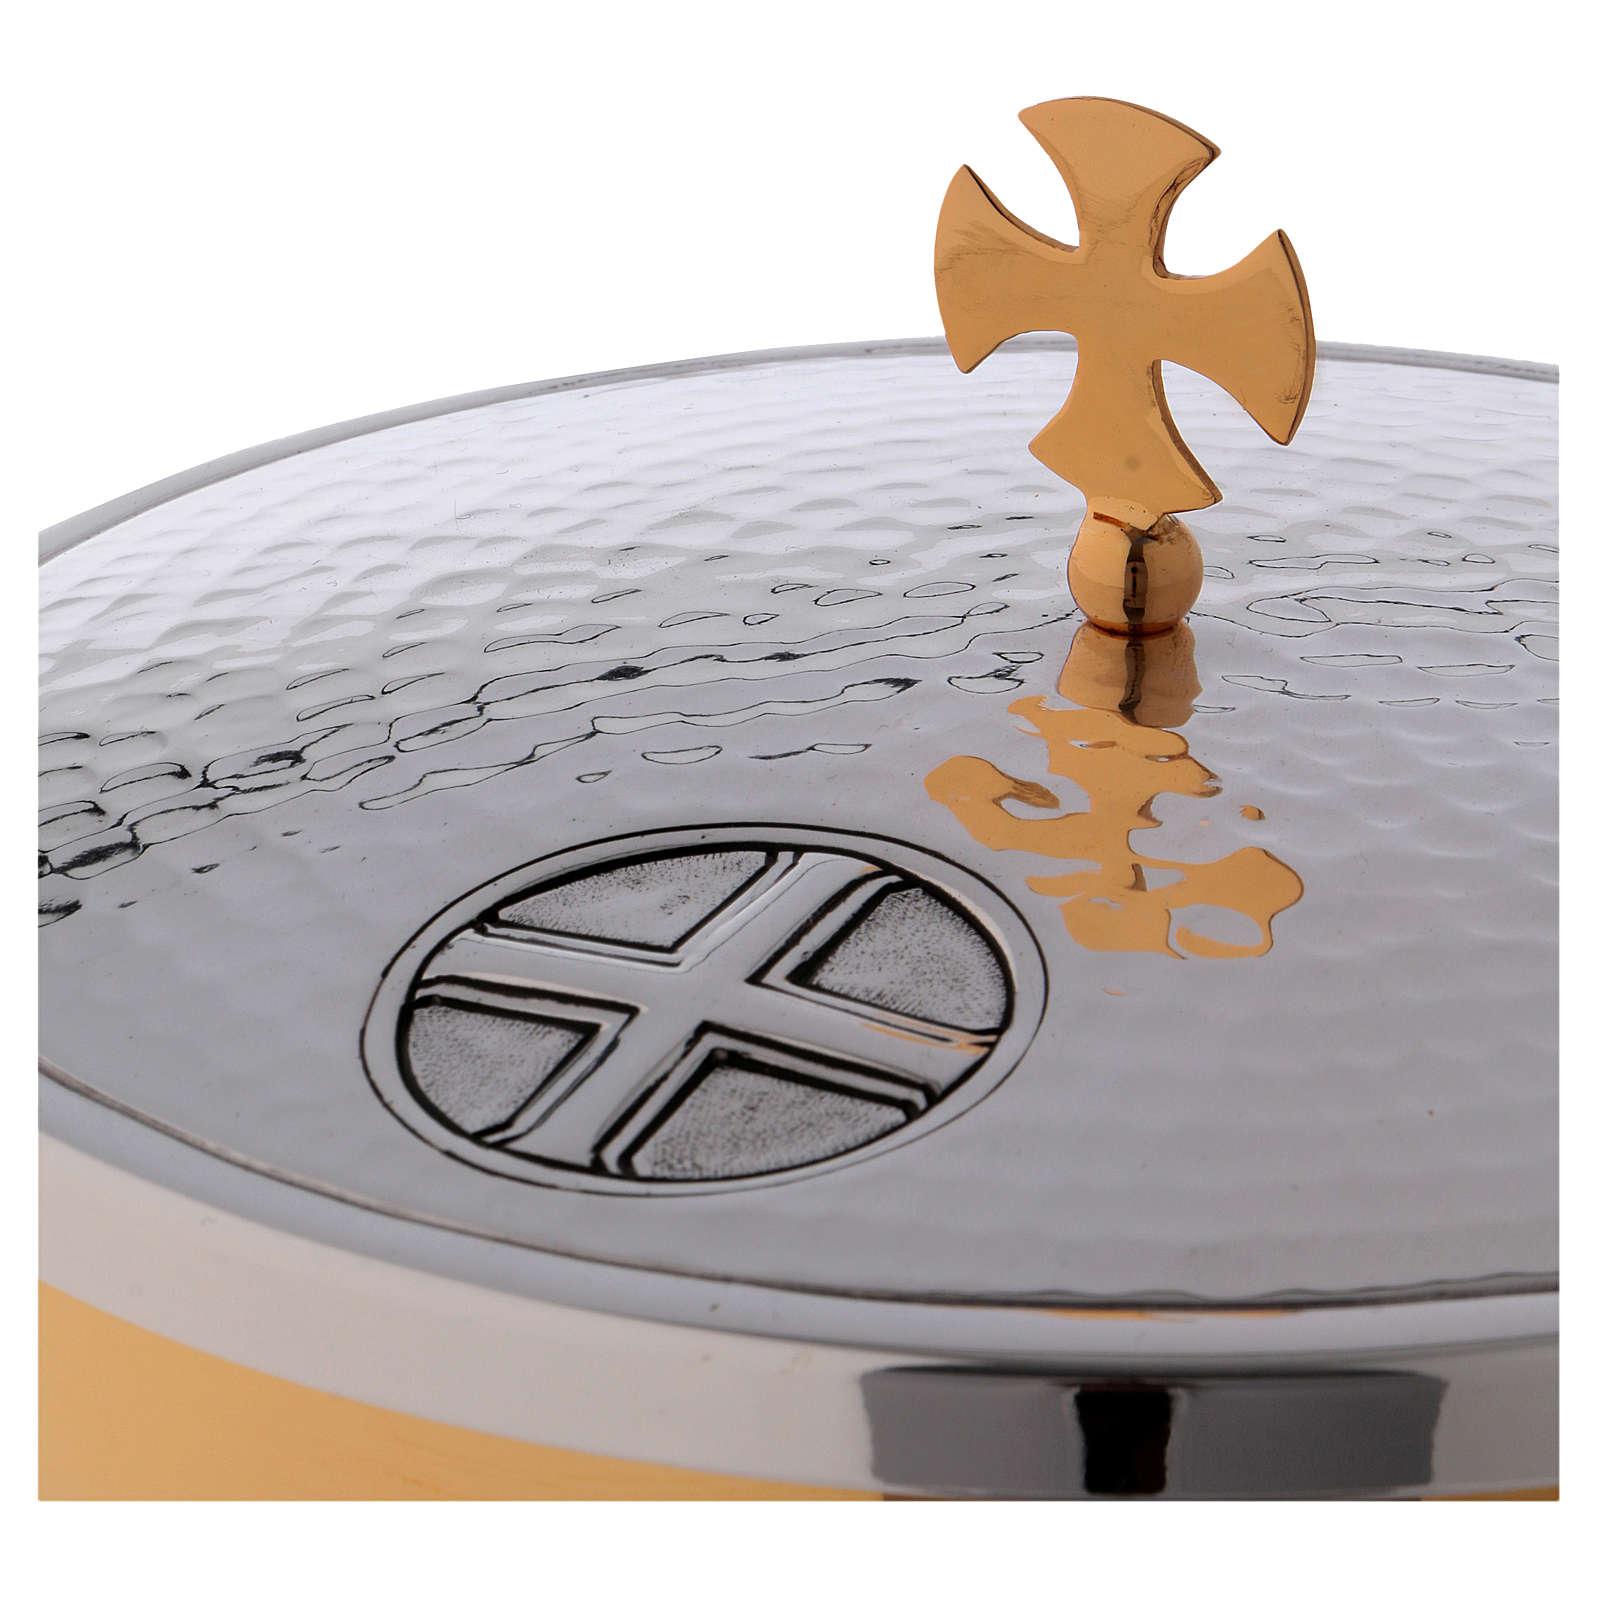 Patena offertoriale ottone croce celtica foglie acanto 4